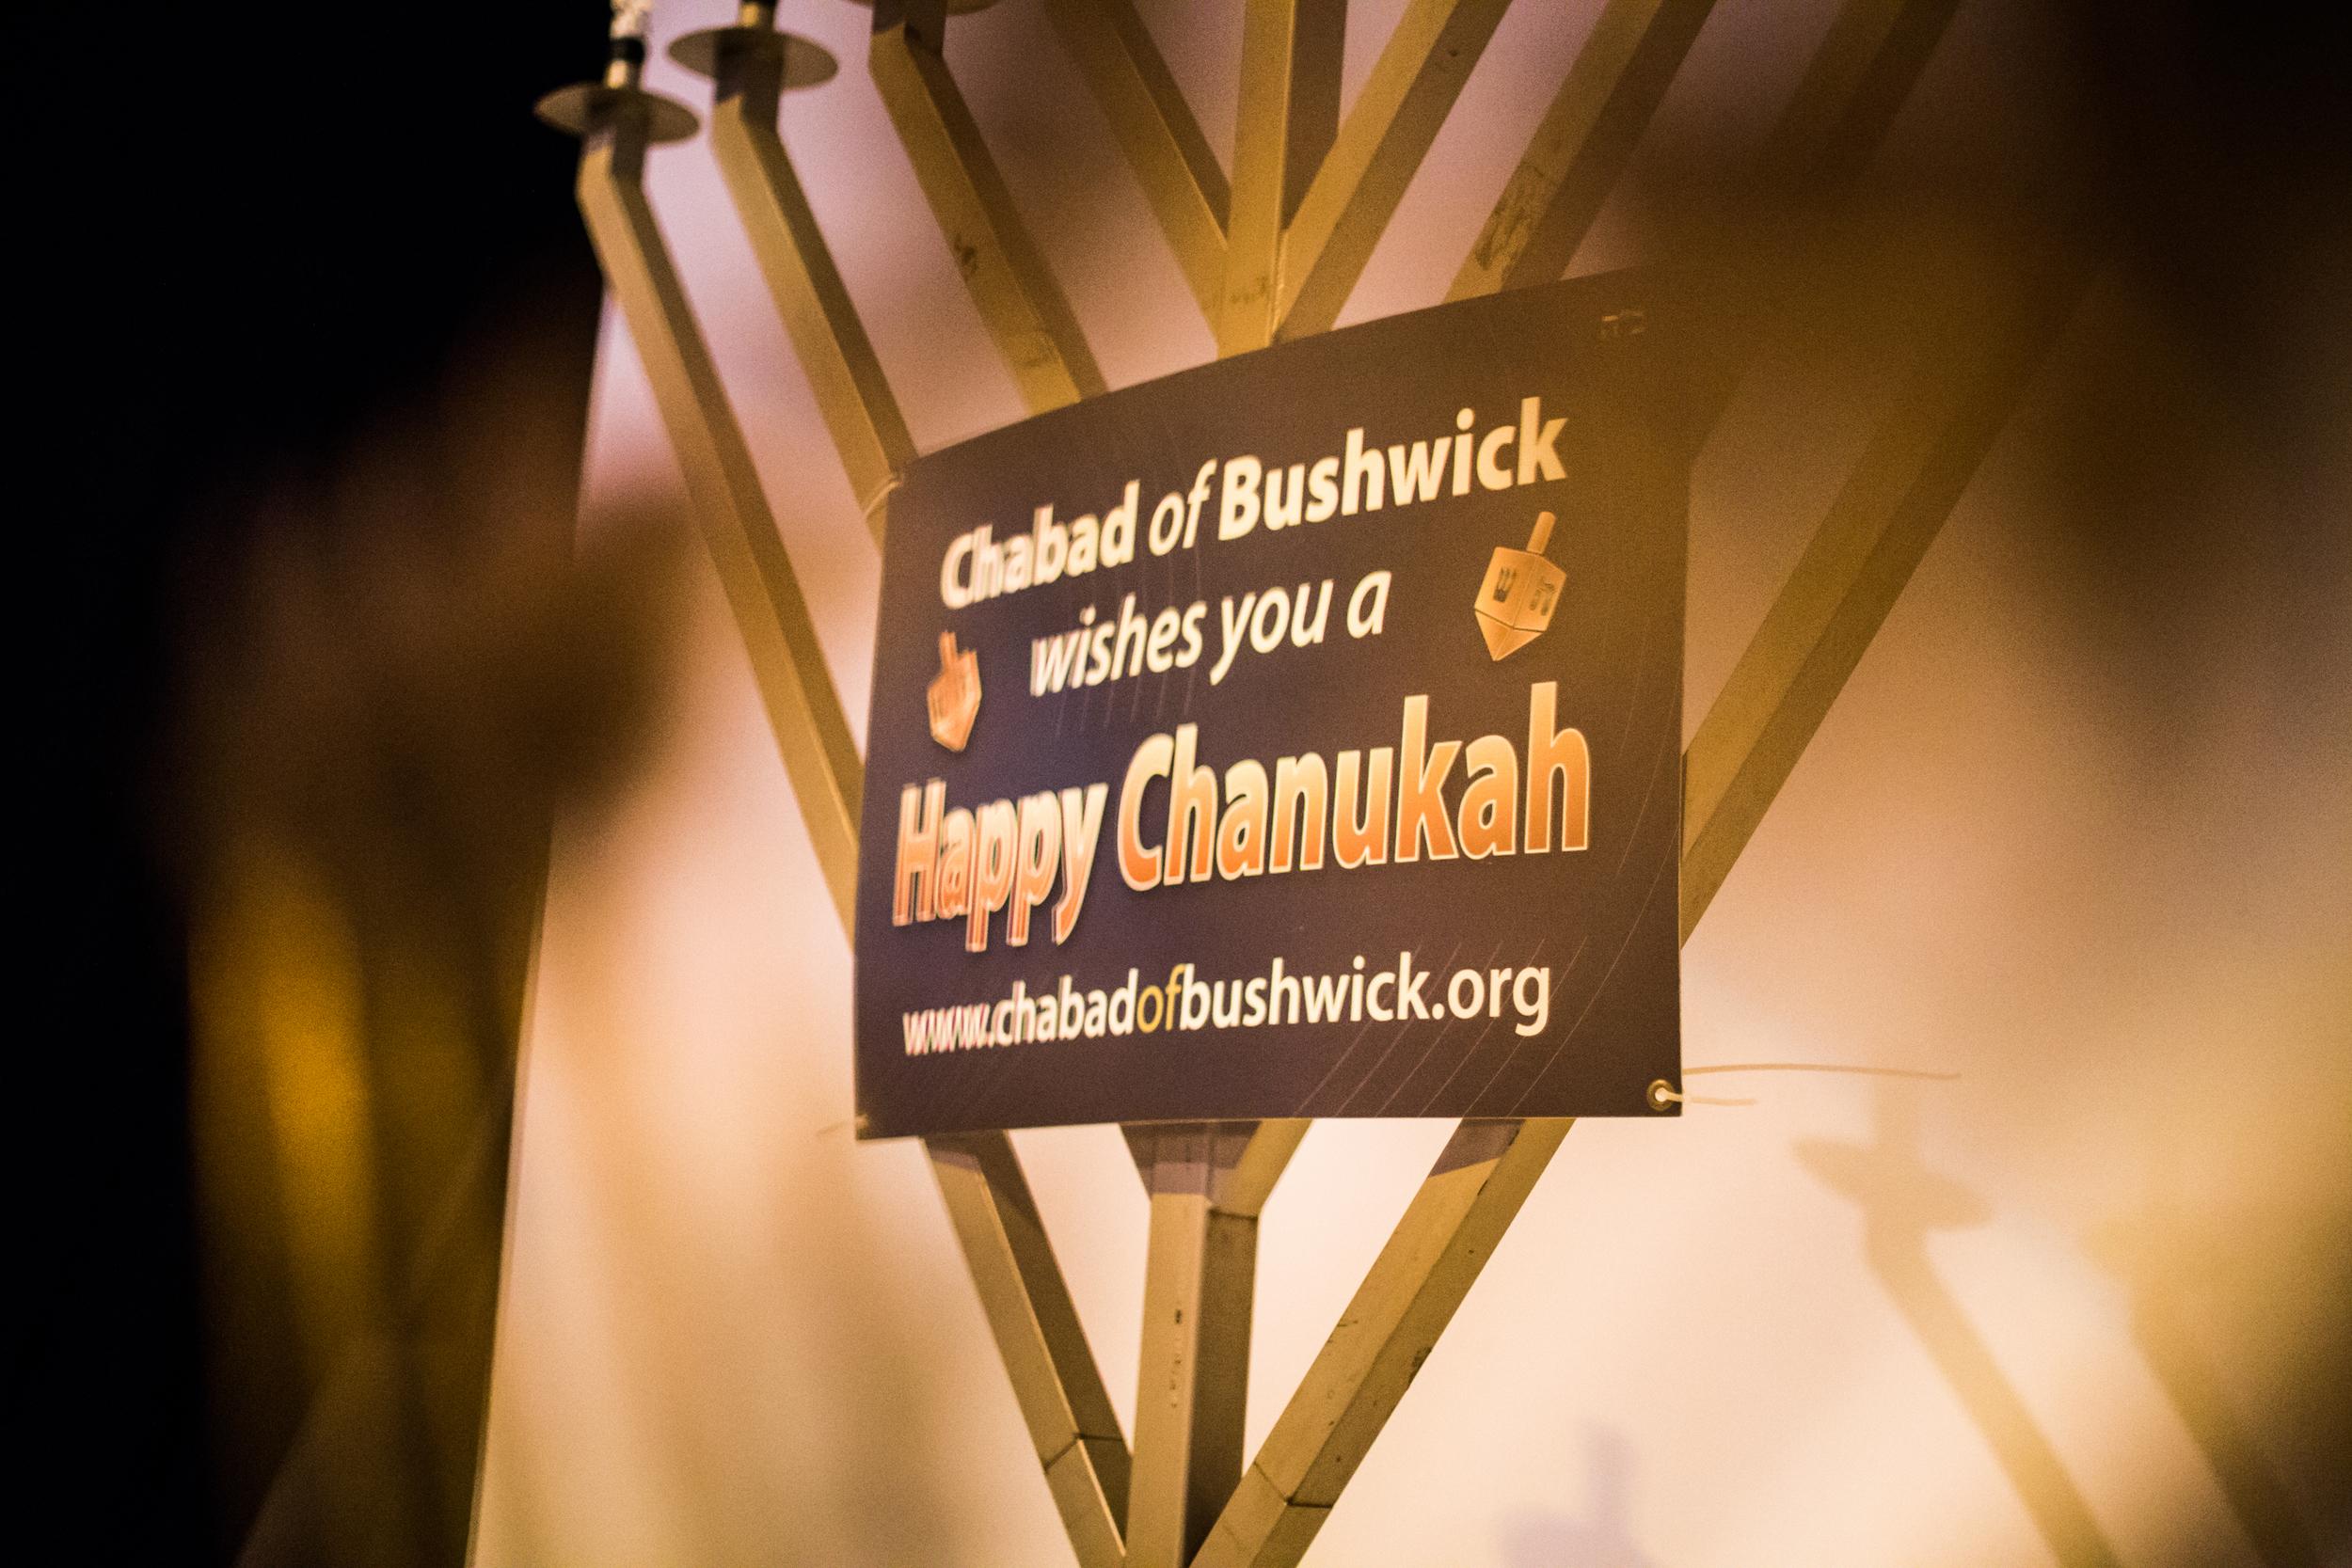 Chanukah with chabad | Piha studio photography, new york, events, -1.jpg